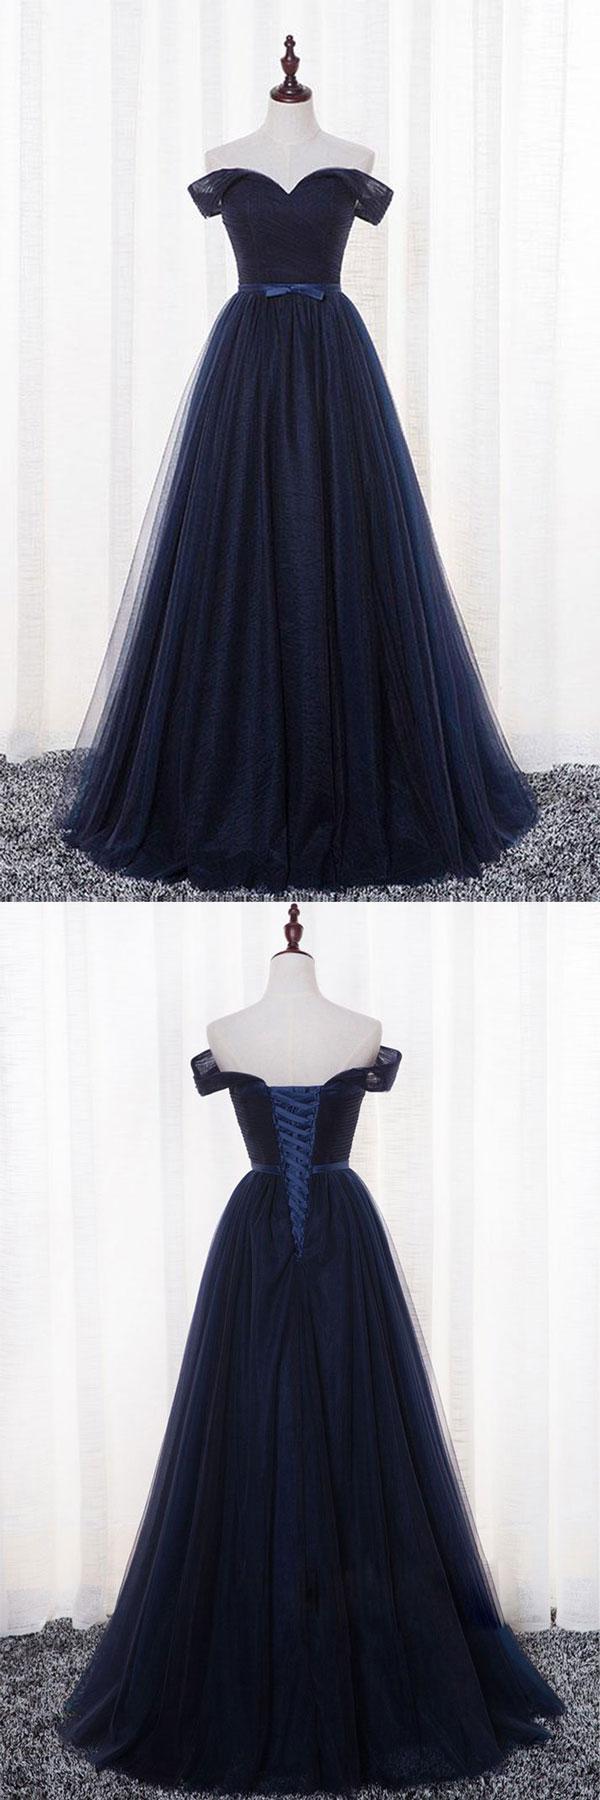 Simple dark blue tulle long prom dress dark blue evening dress